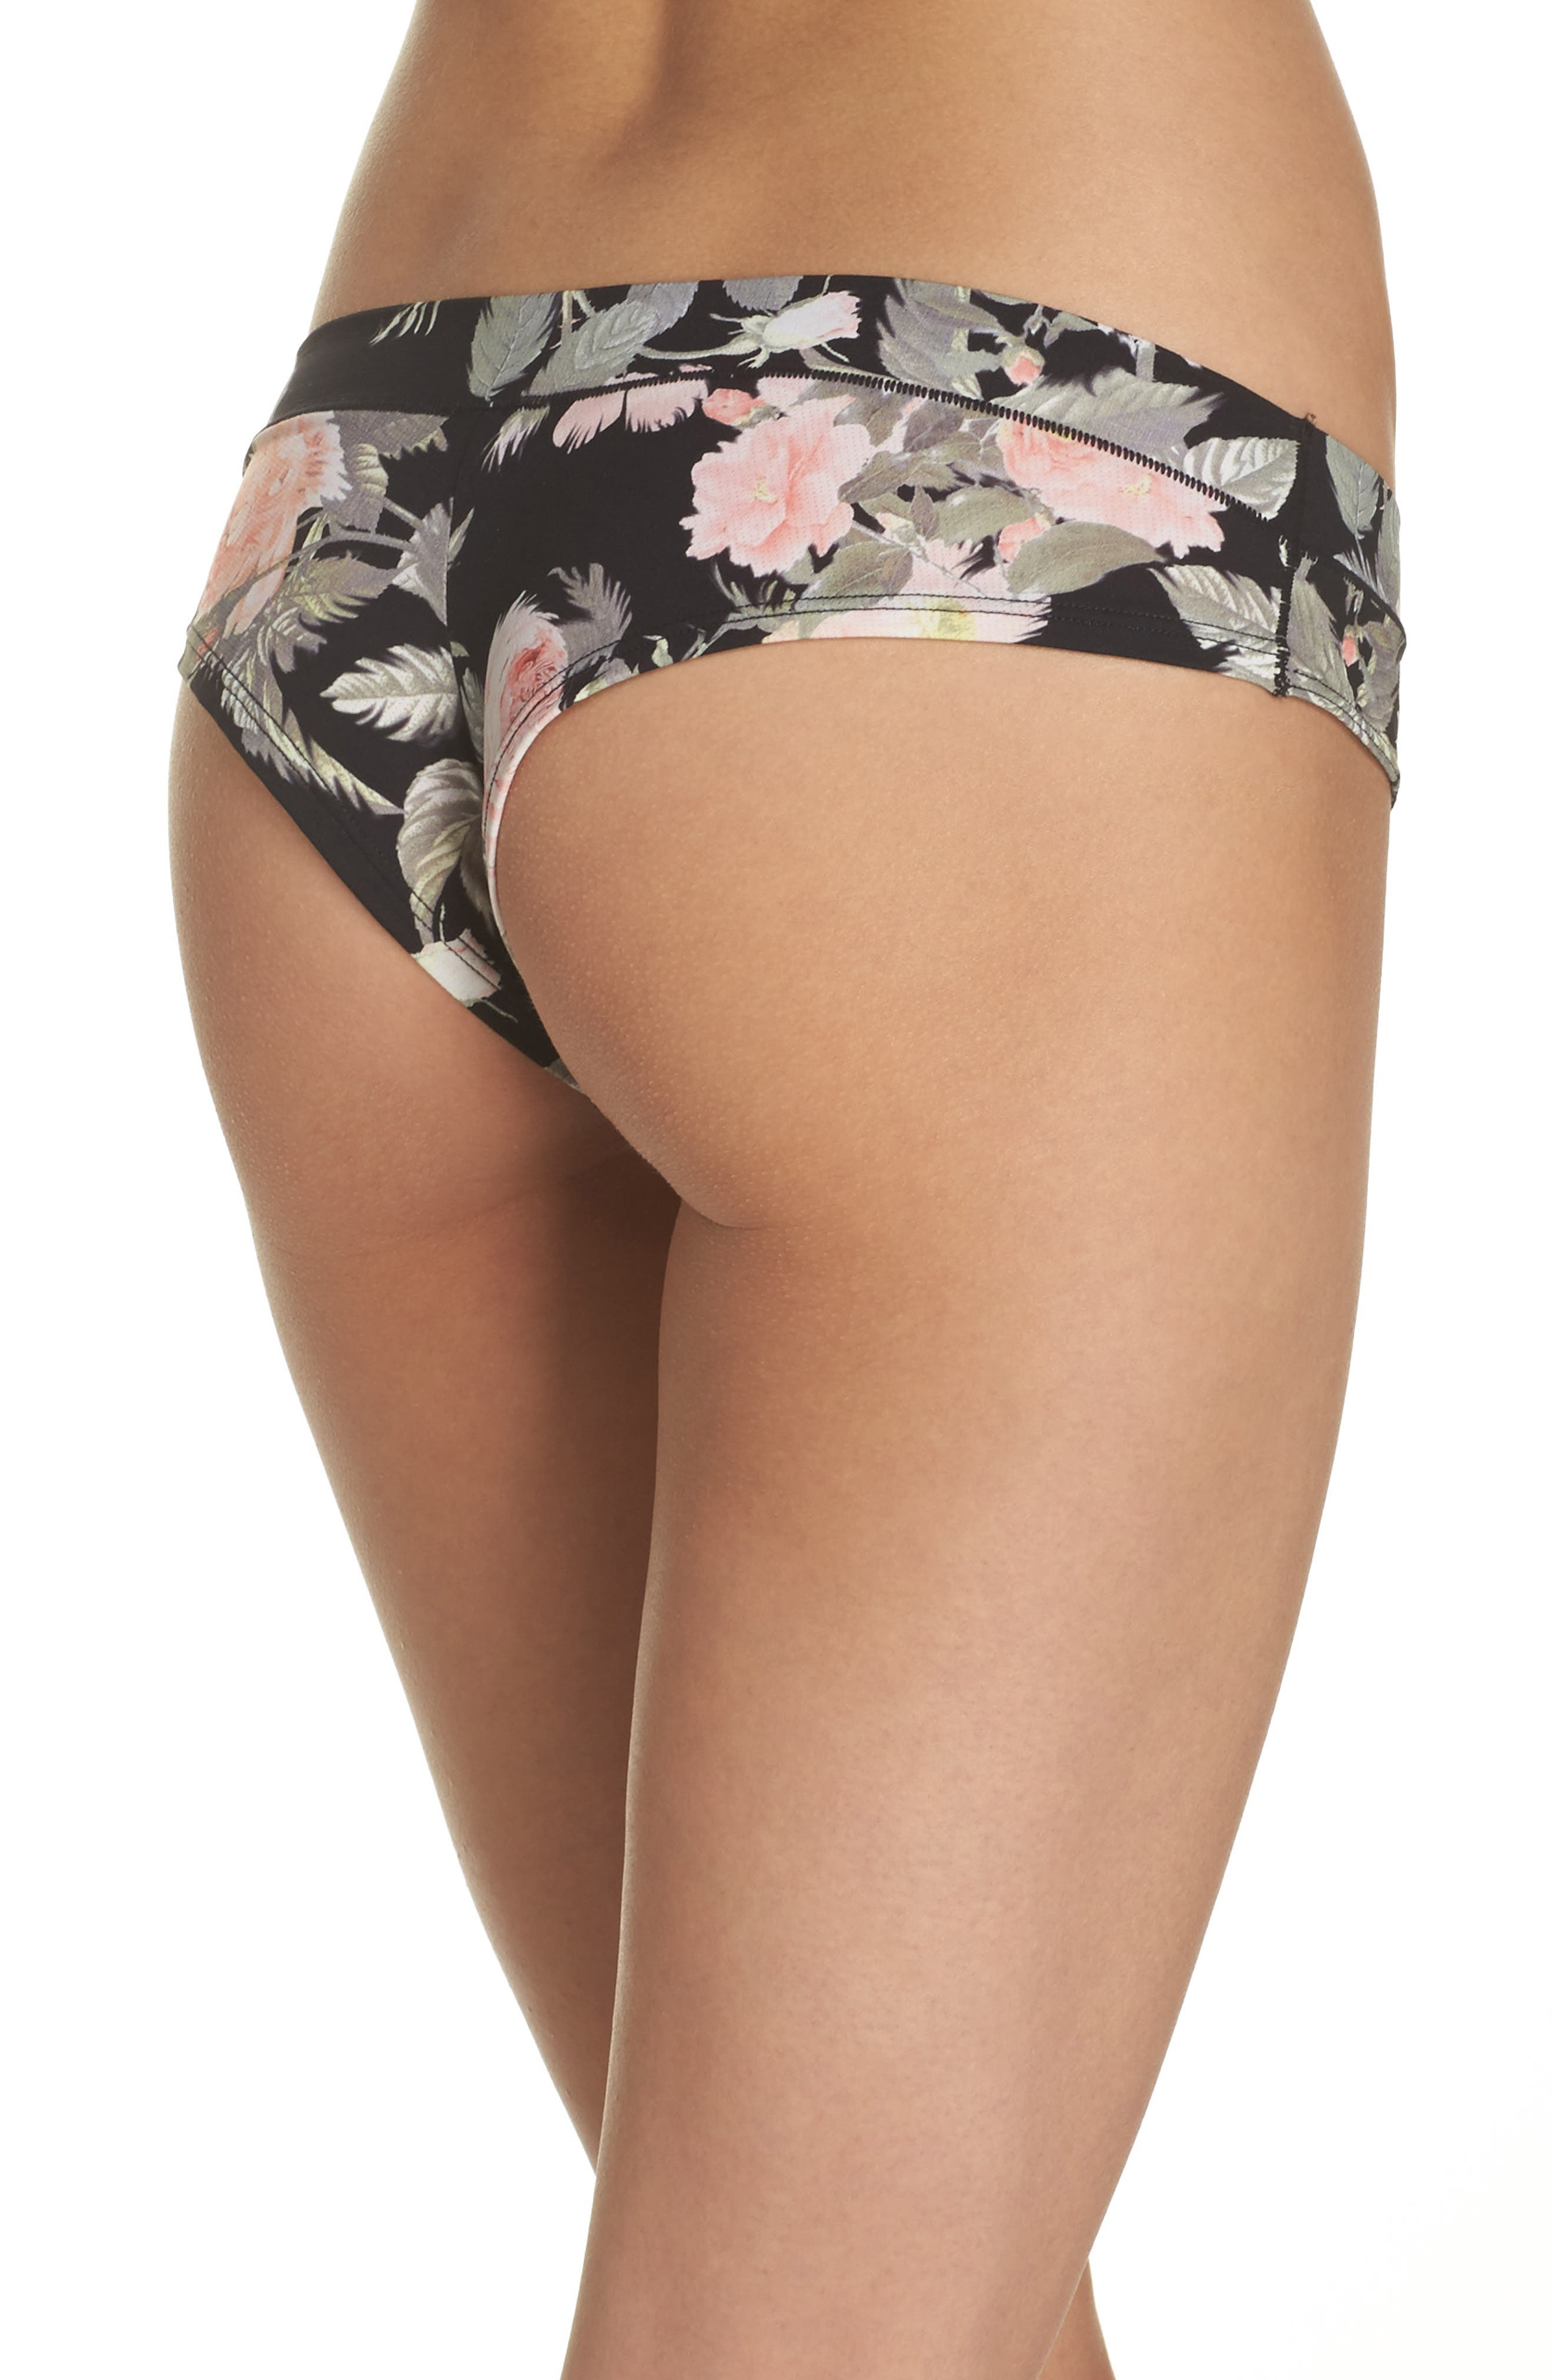 Beau Floral Cheeky Panties,                             Alternate thumbnail 2, color,                             001